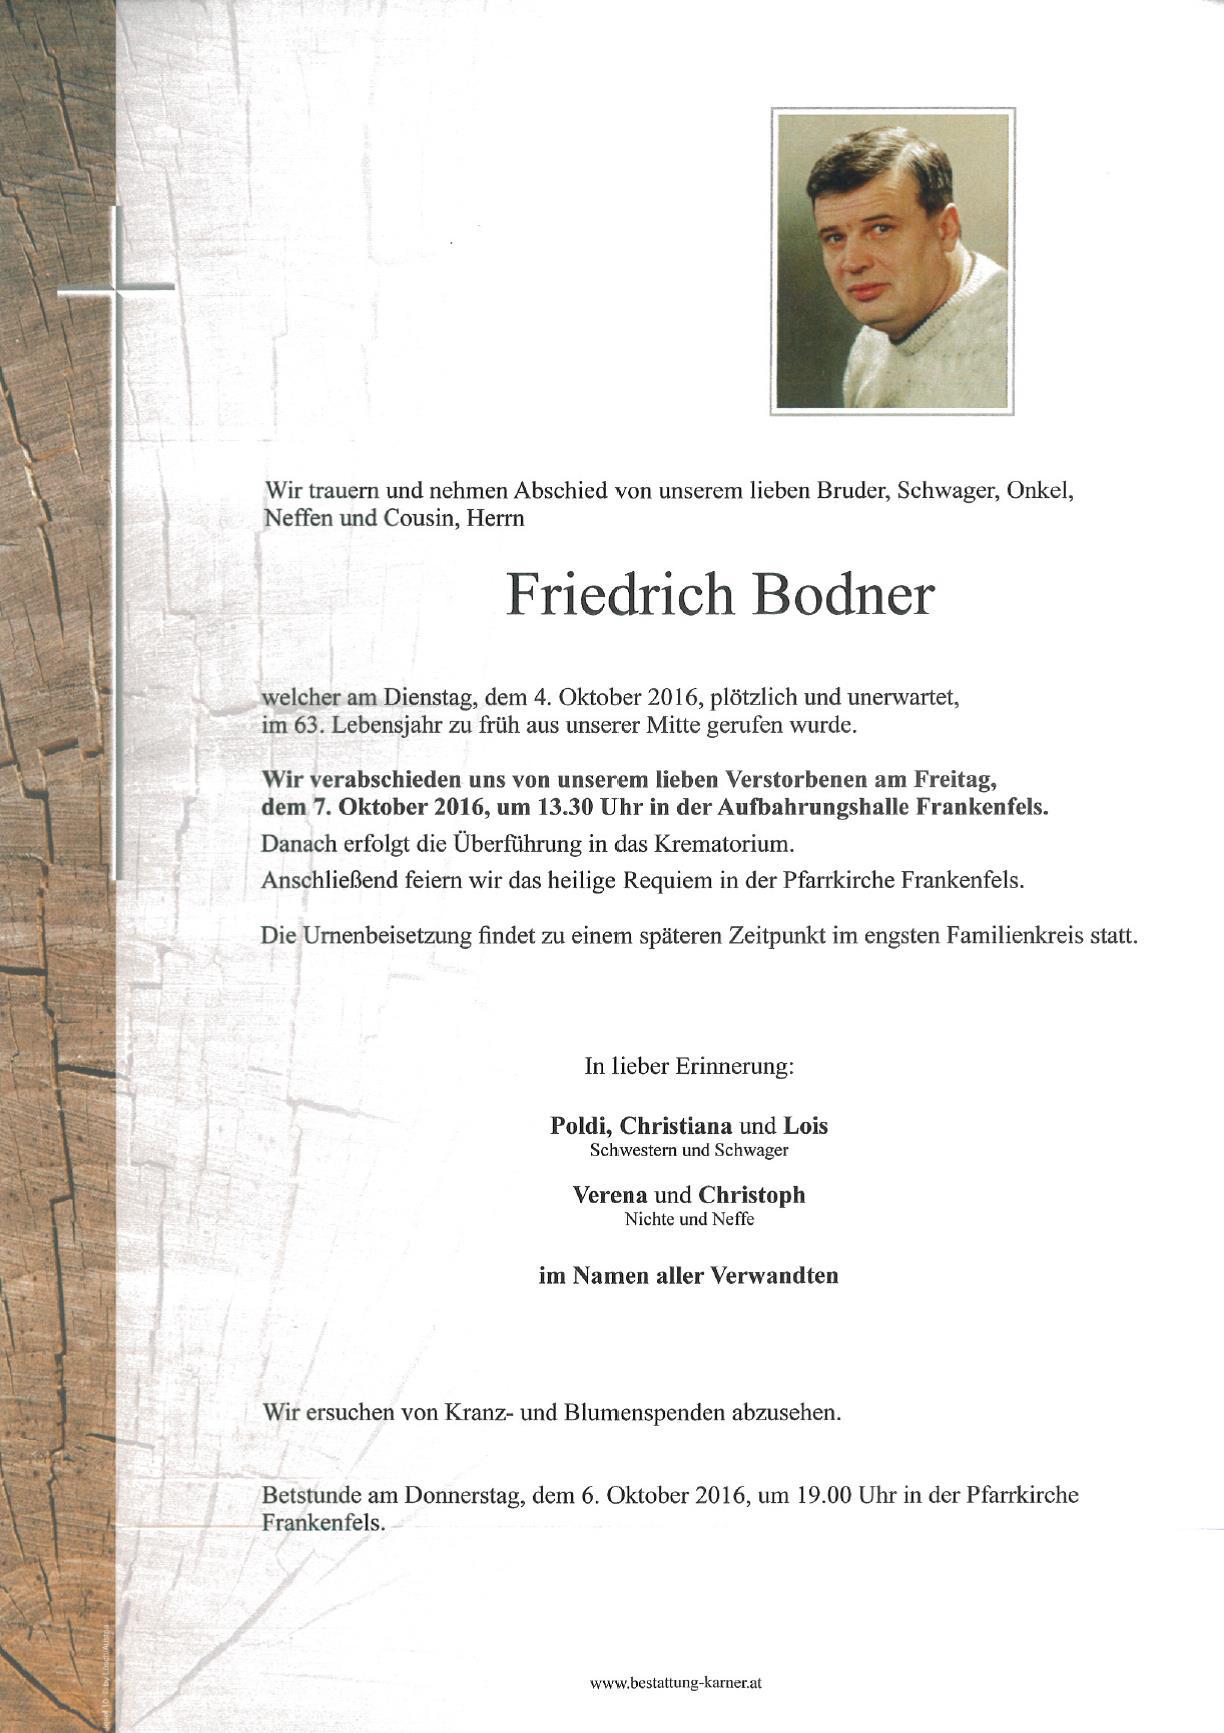 friedrich-bodner